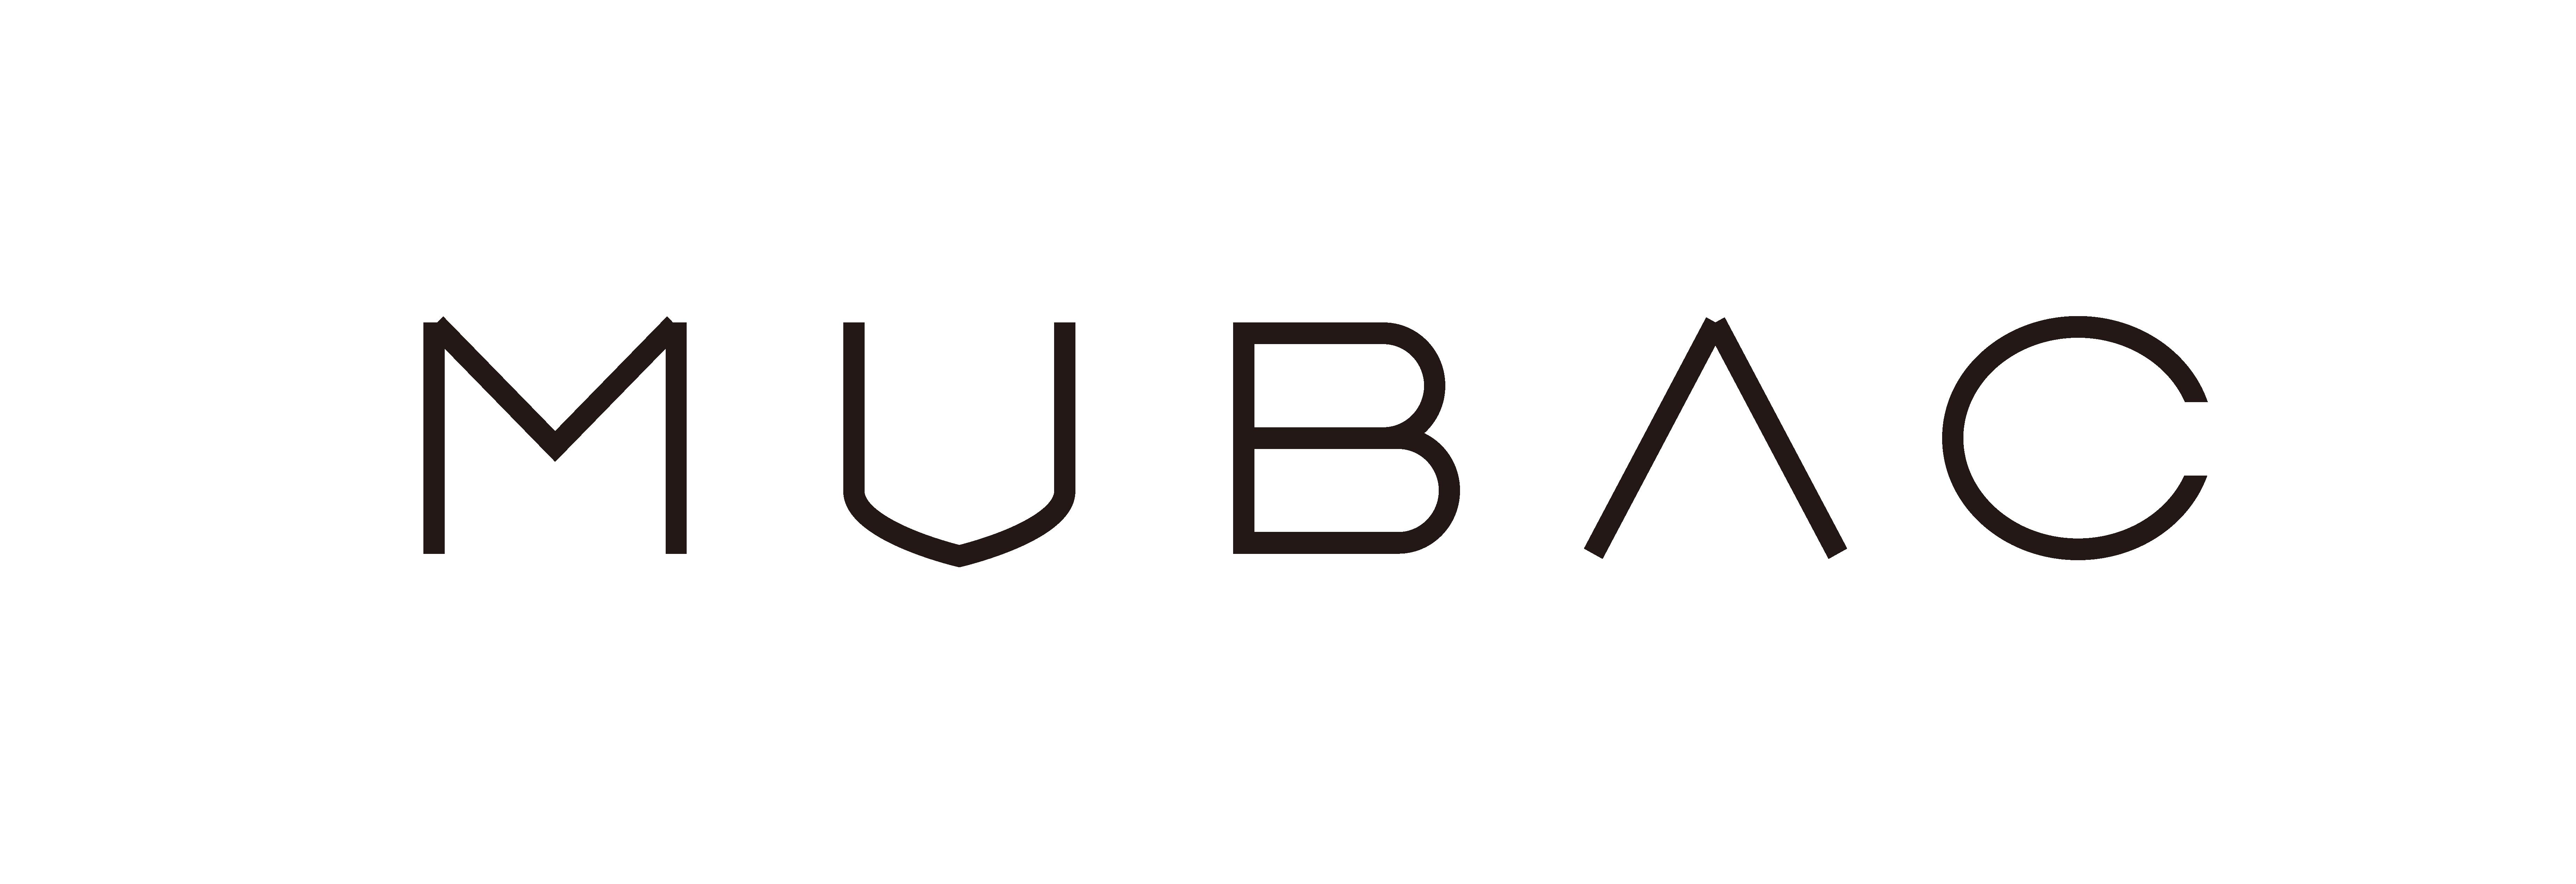 MUBAC brand site